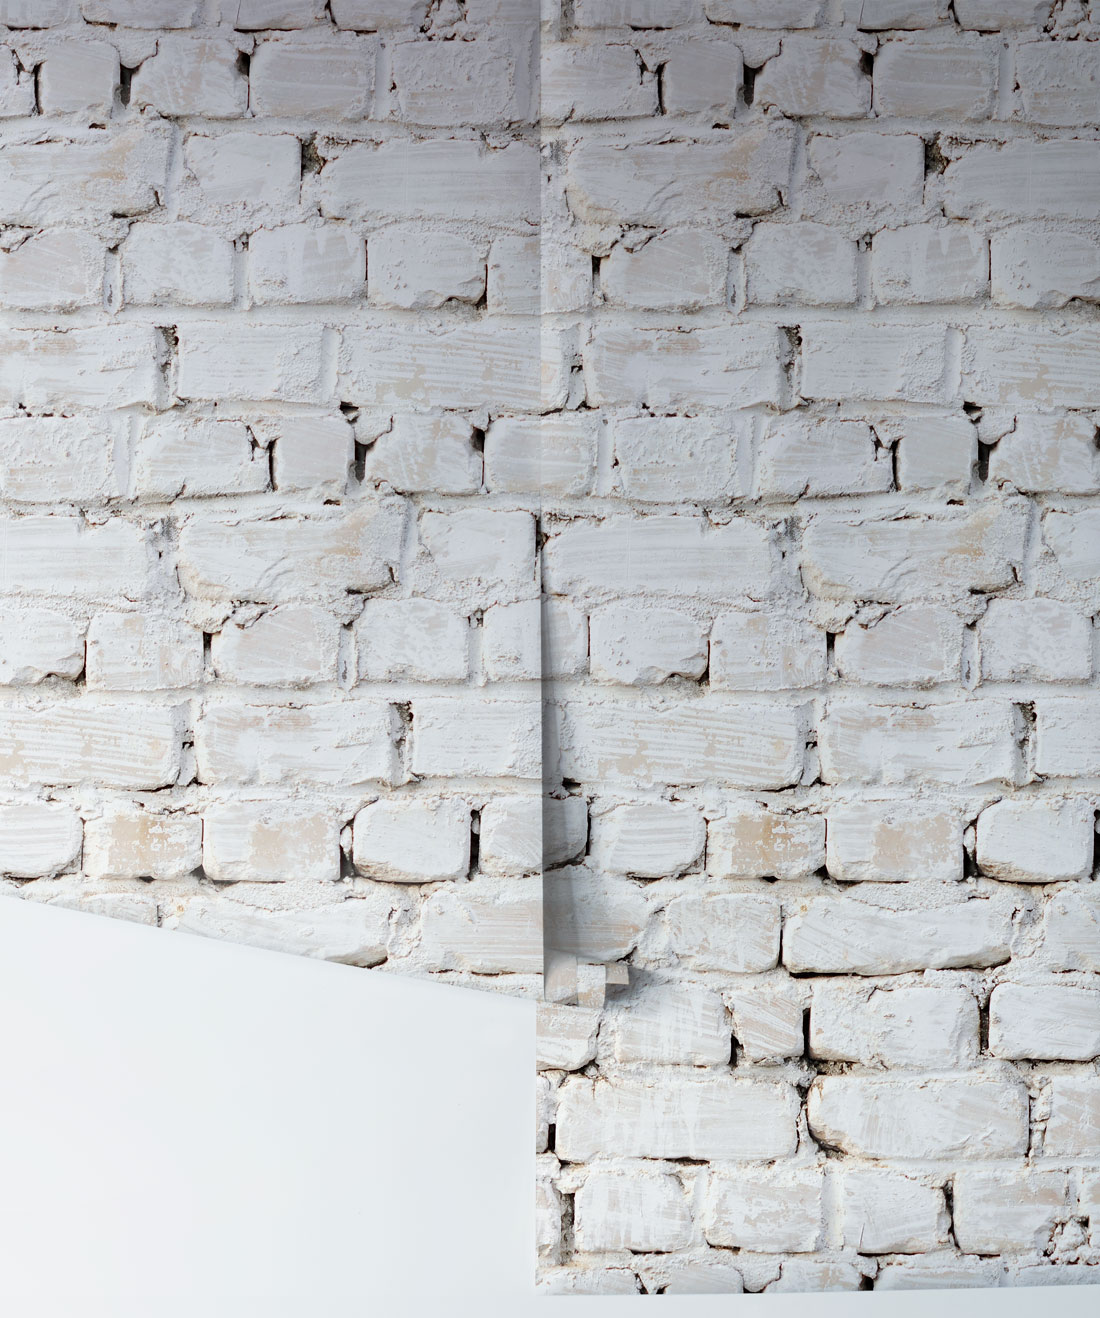 Whitewash Brick Wall: Whitewash Bricks Wallpaper, White Rustic Brick Wallpaper